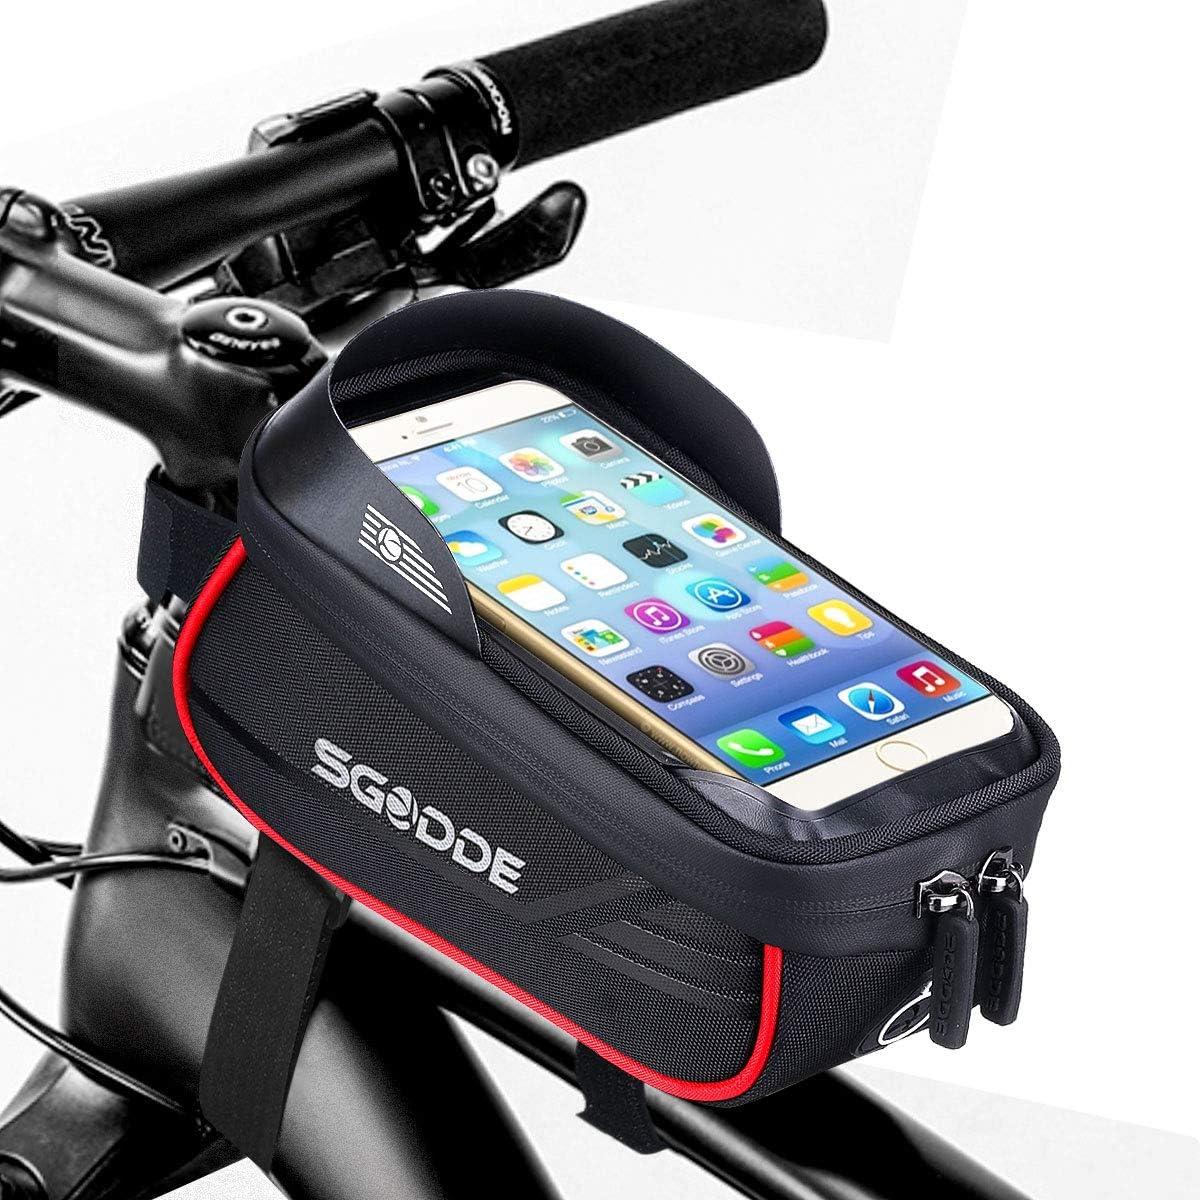 Bolsa impermeable Sgodde para bicicletas por sólo 12,59€ con el #código: SGODDE705